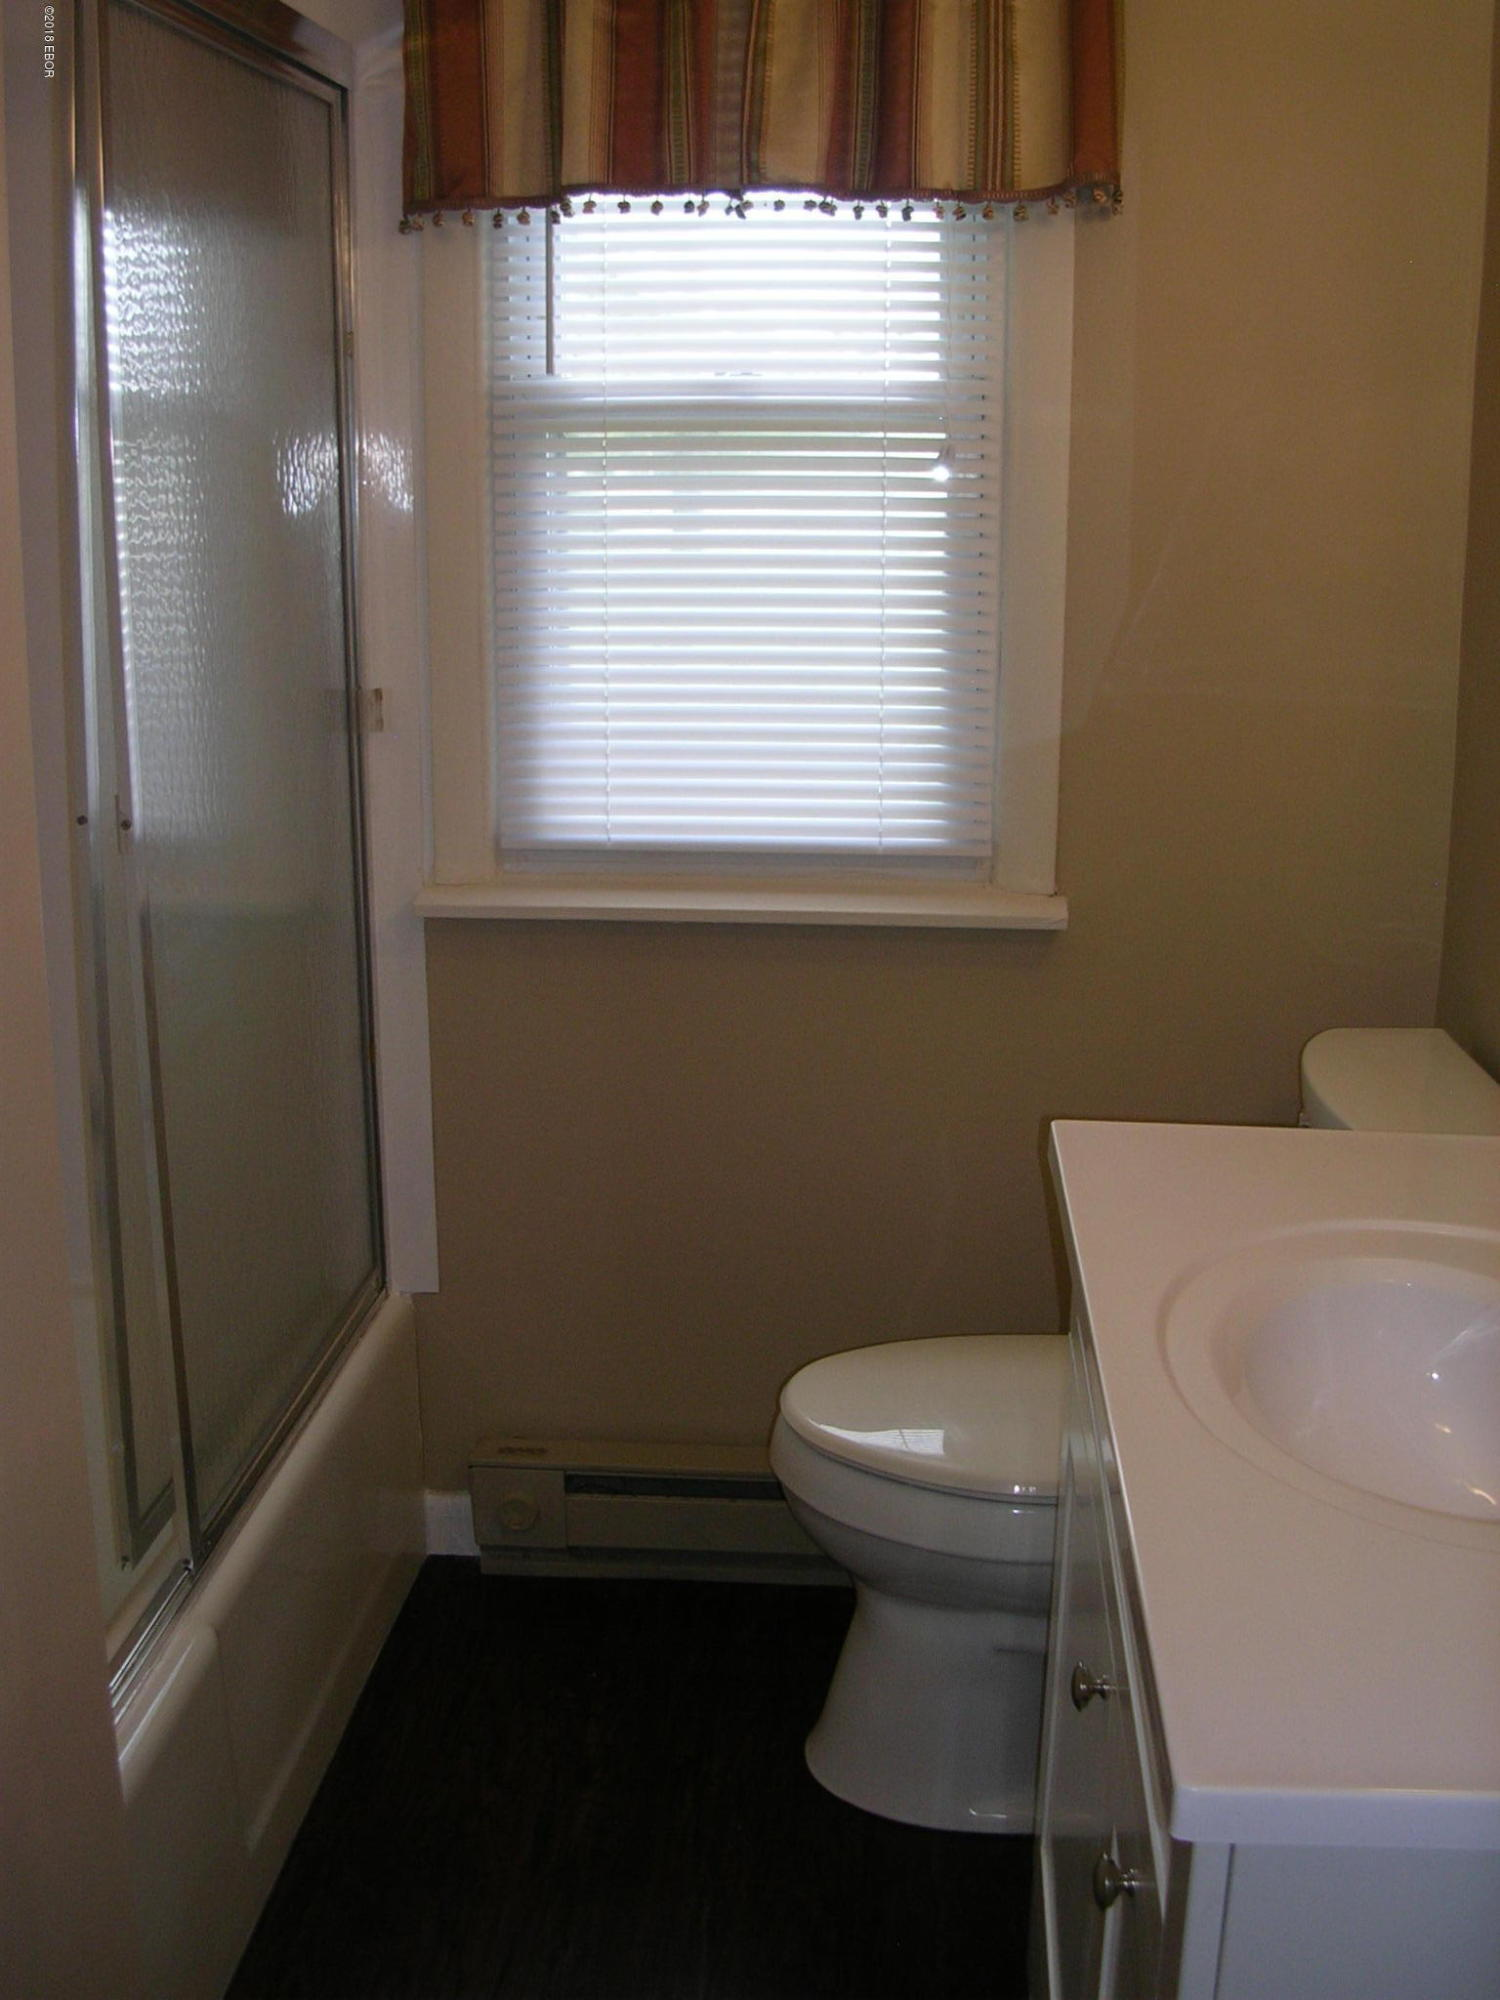 MLS#:422640 Address: S 820 Broadway Goreville 62939